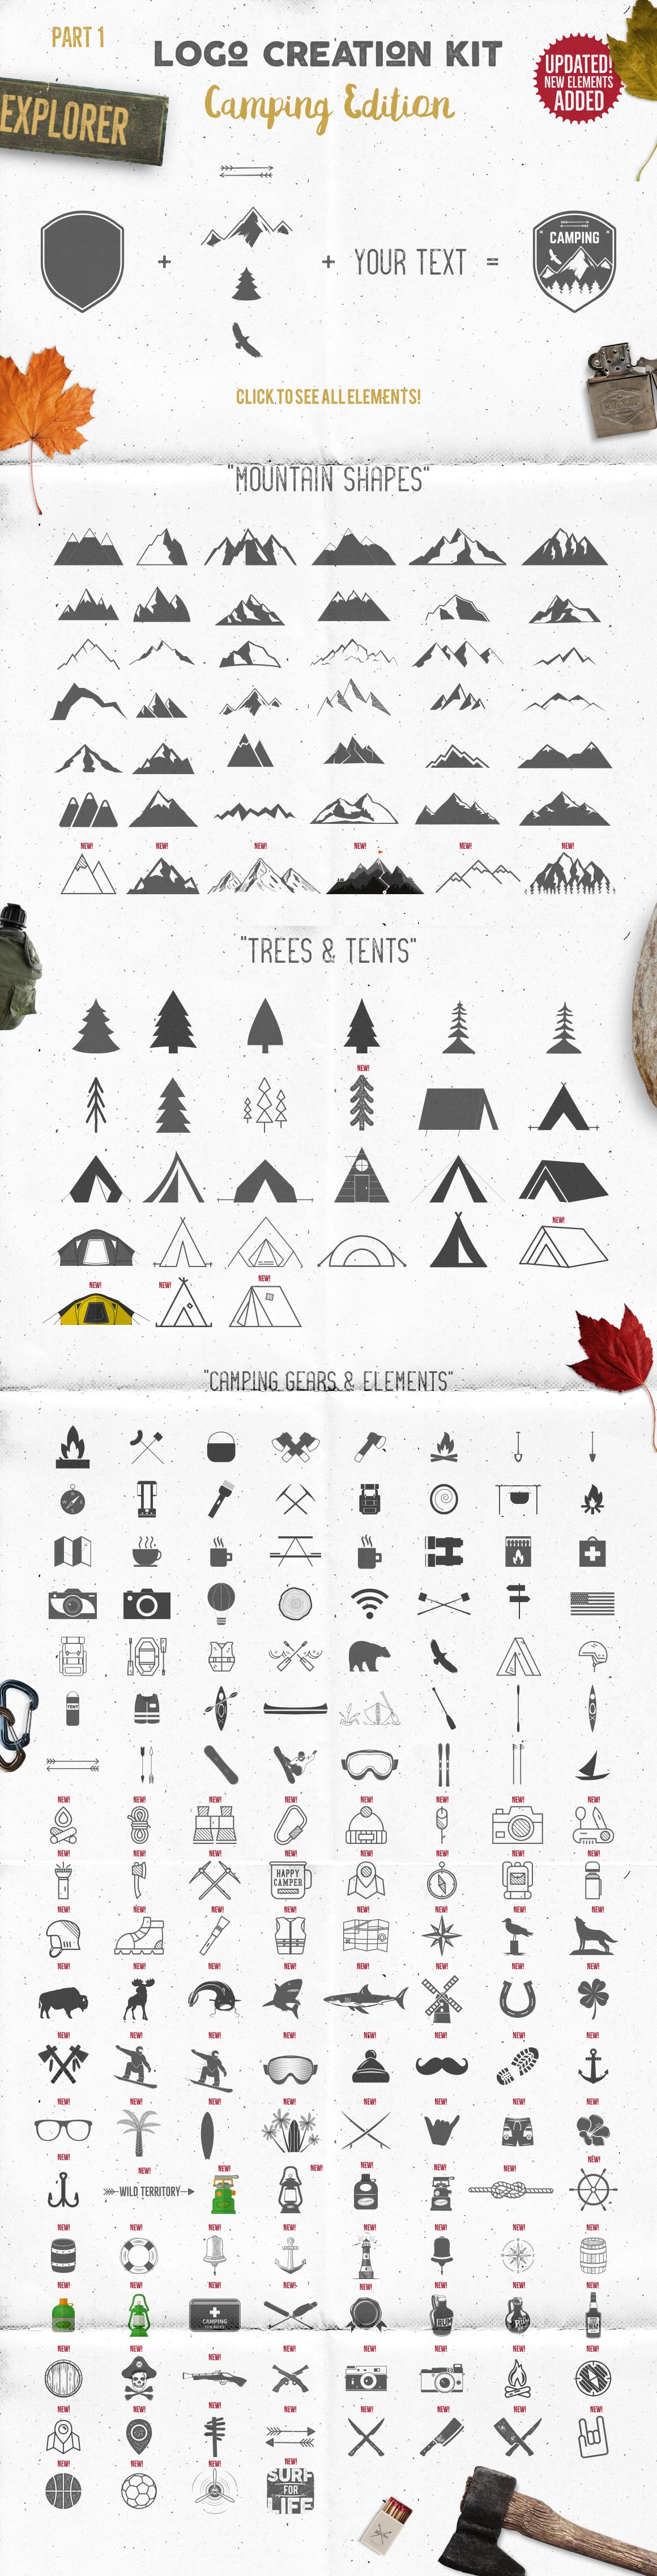 Logo Creation Kit - Camping Edition example image 18